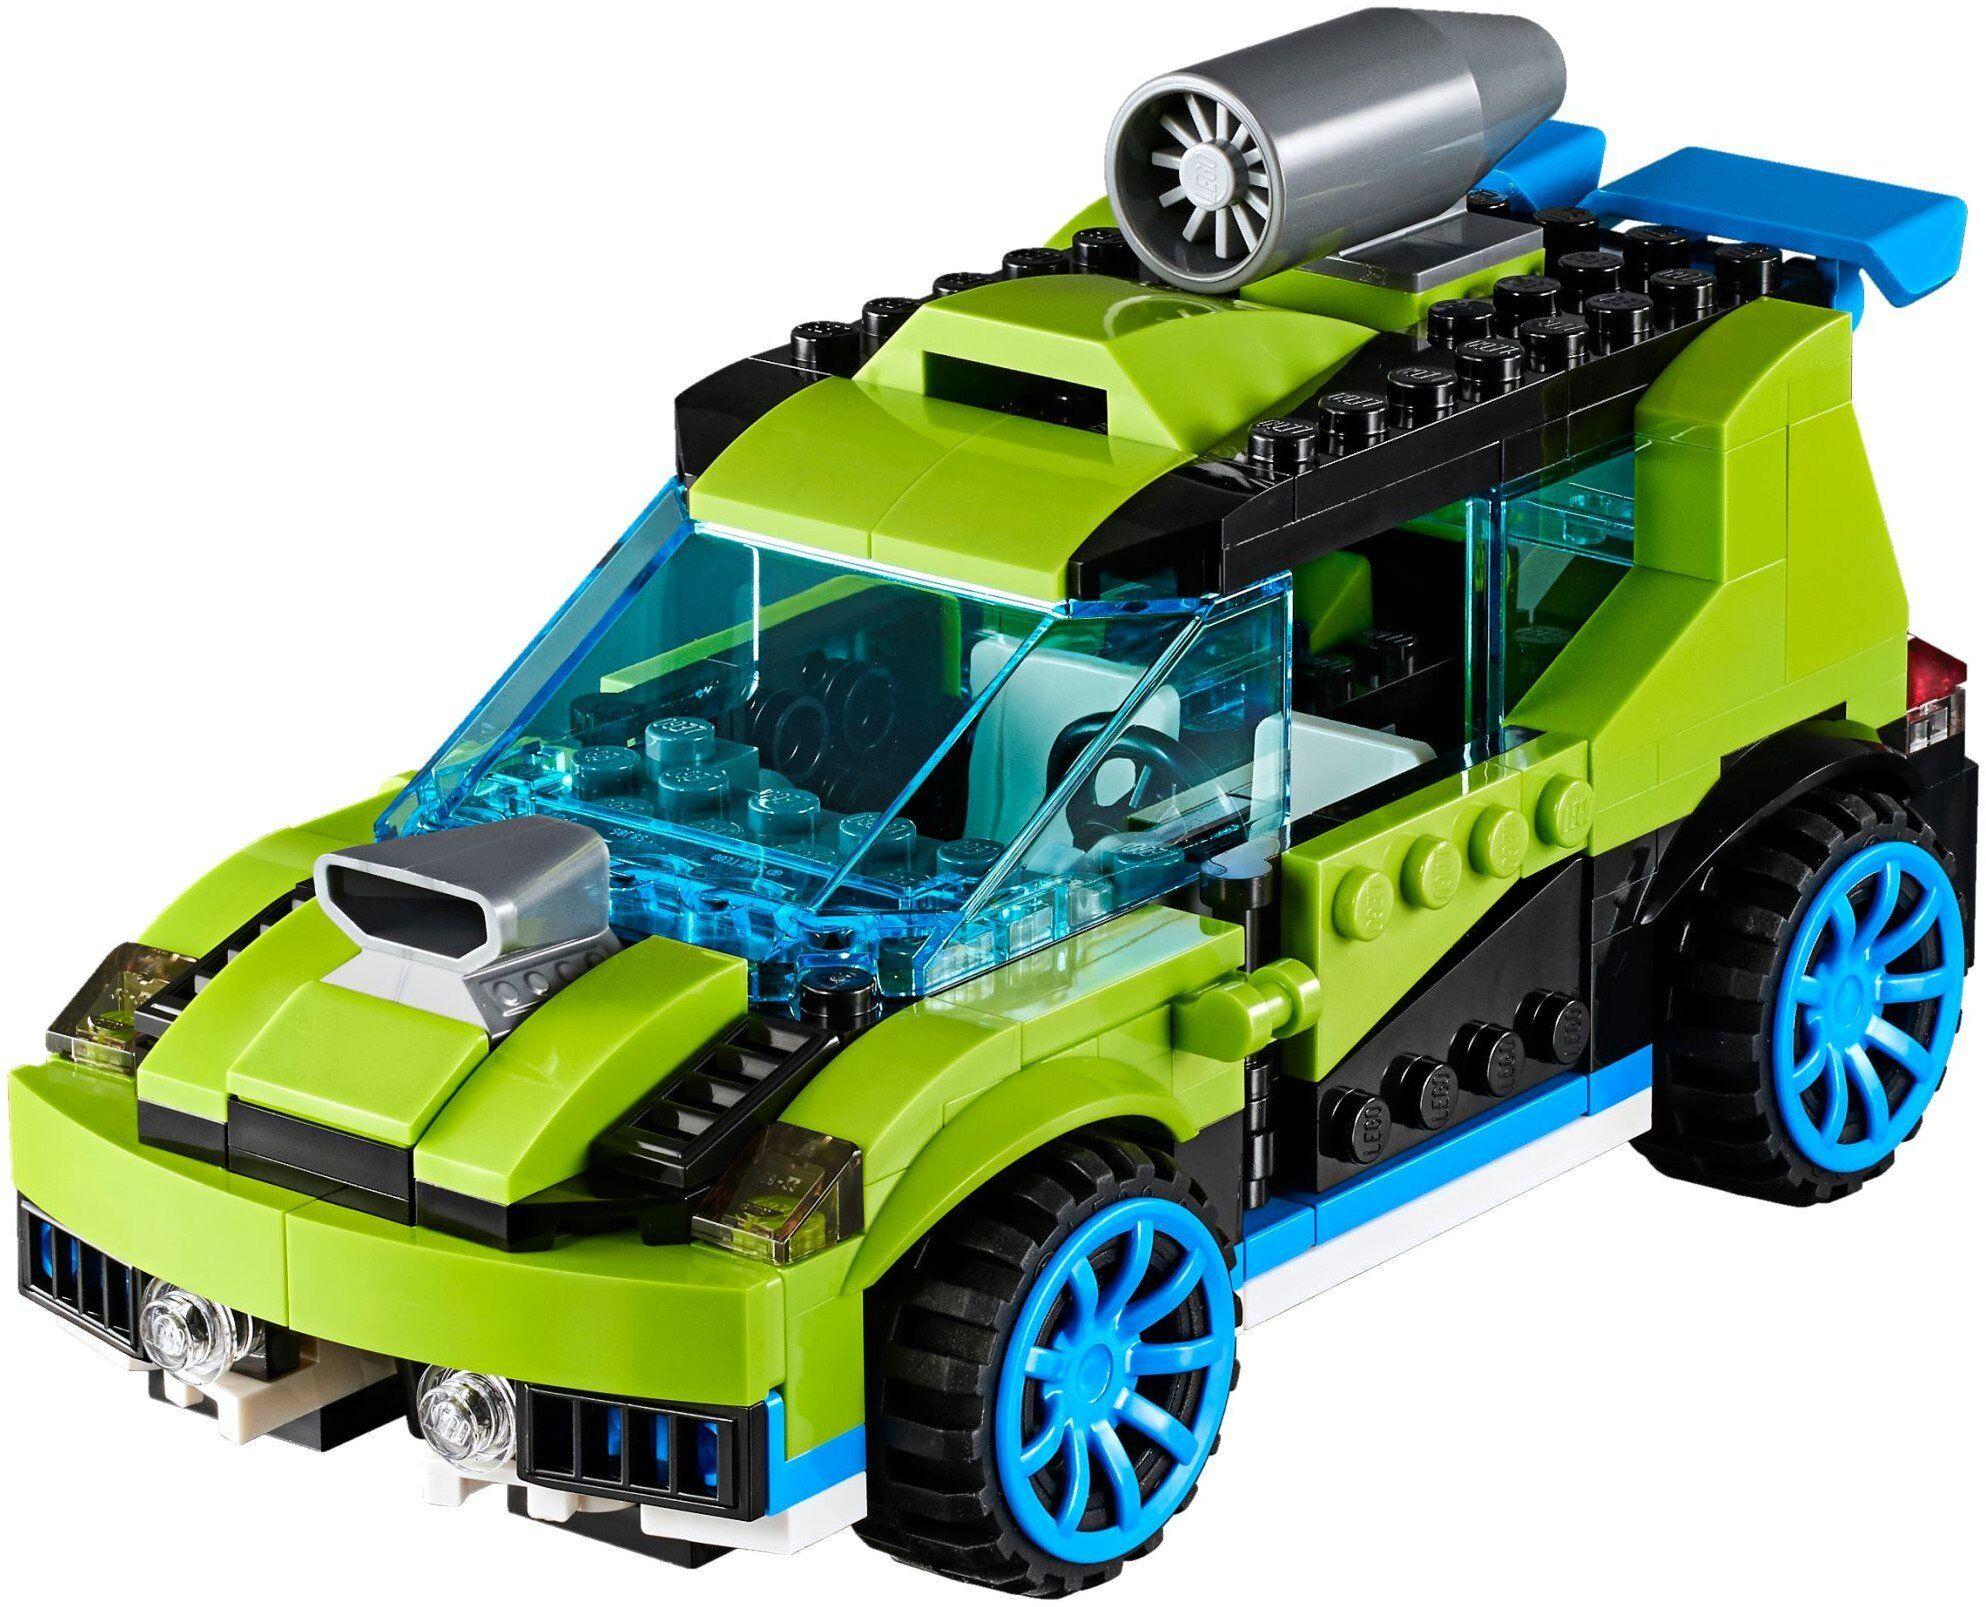 Lego Creator Rocket Rally Car (31074)